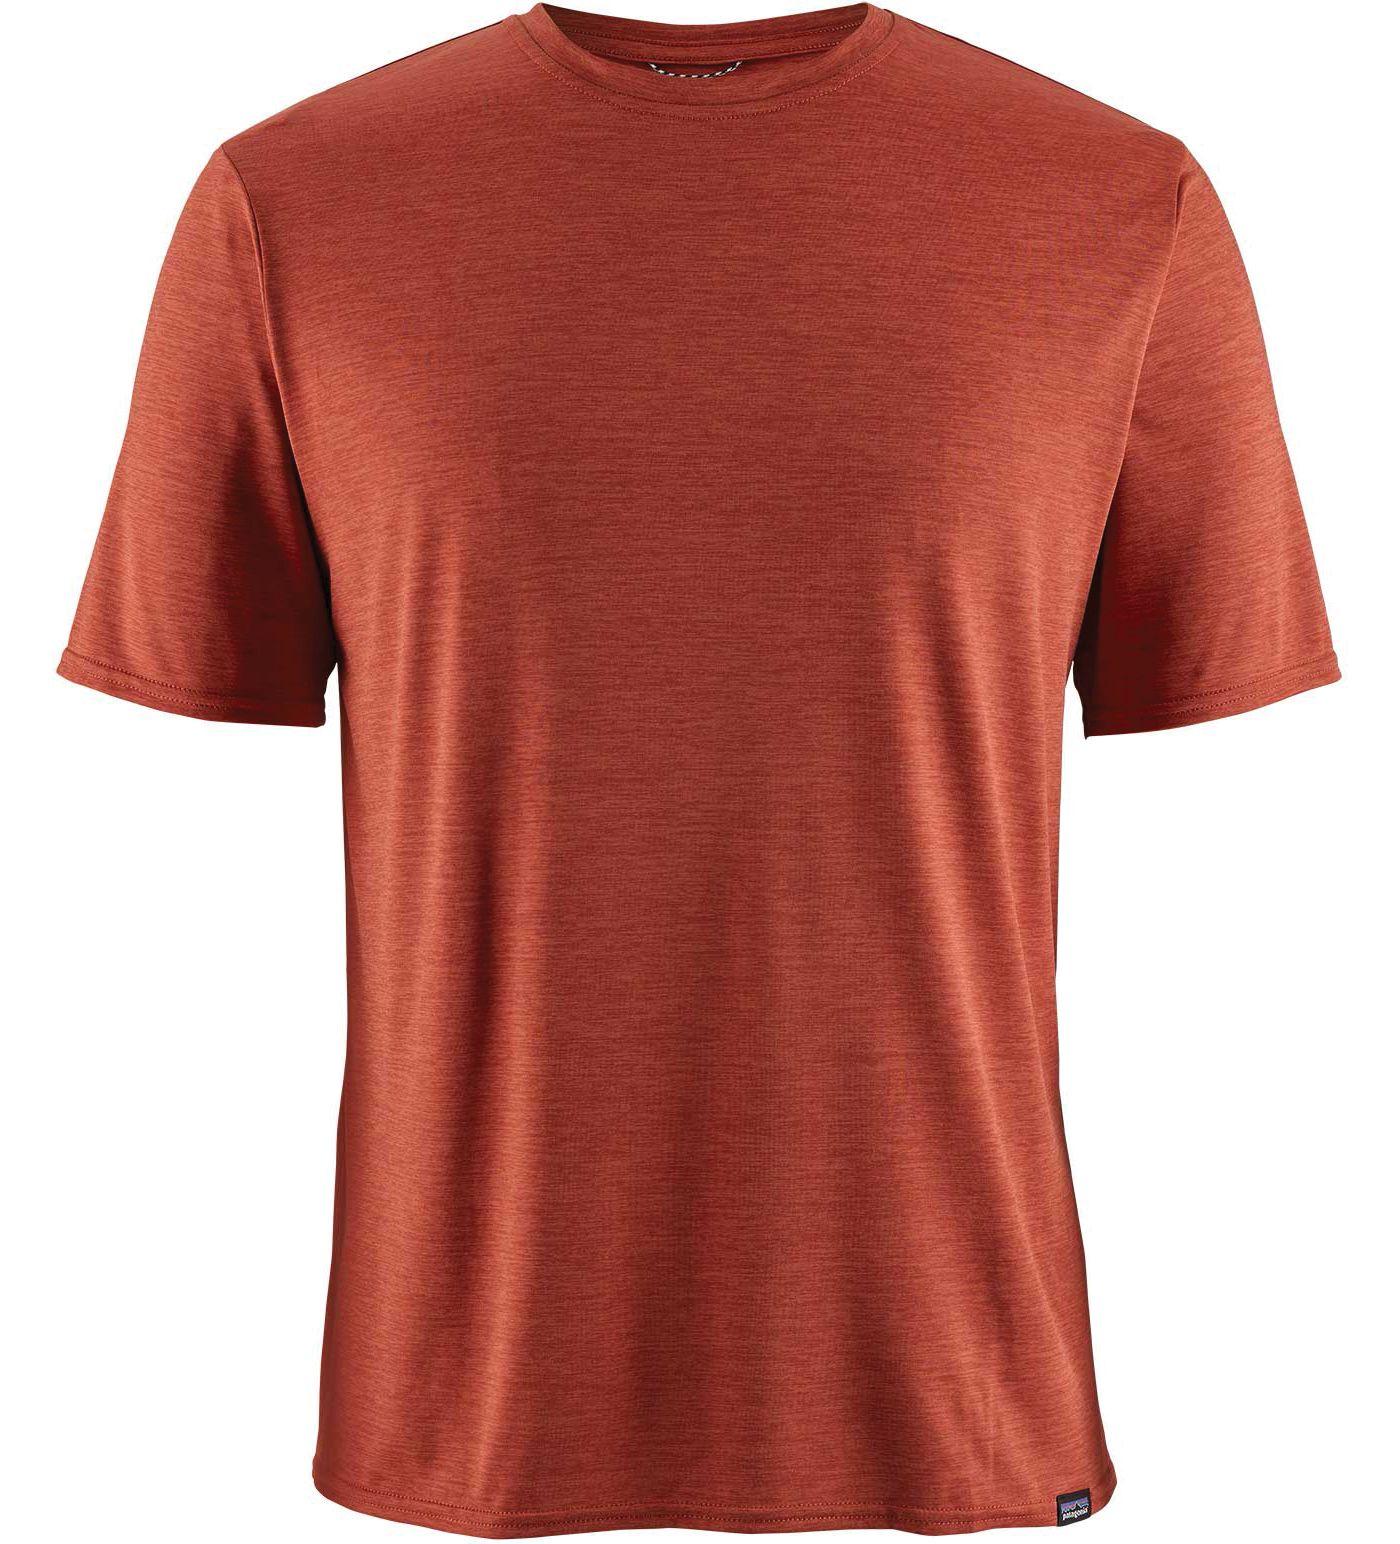 Patagonia Men's Capilene Cool Daily Shirt